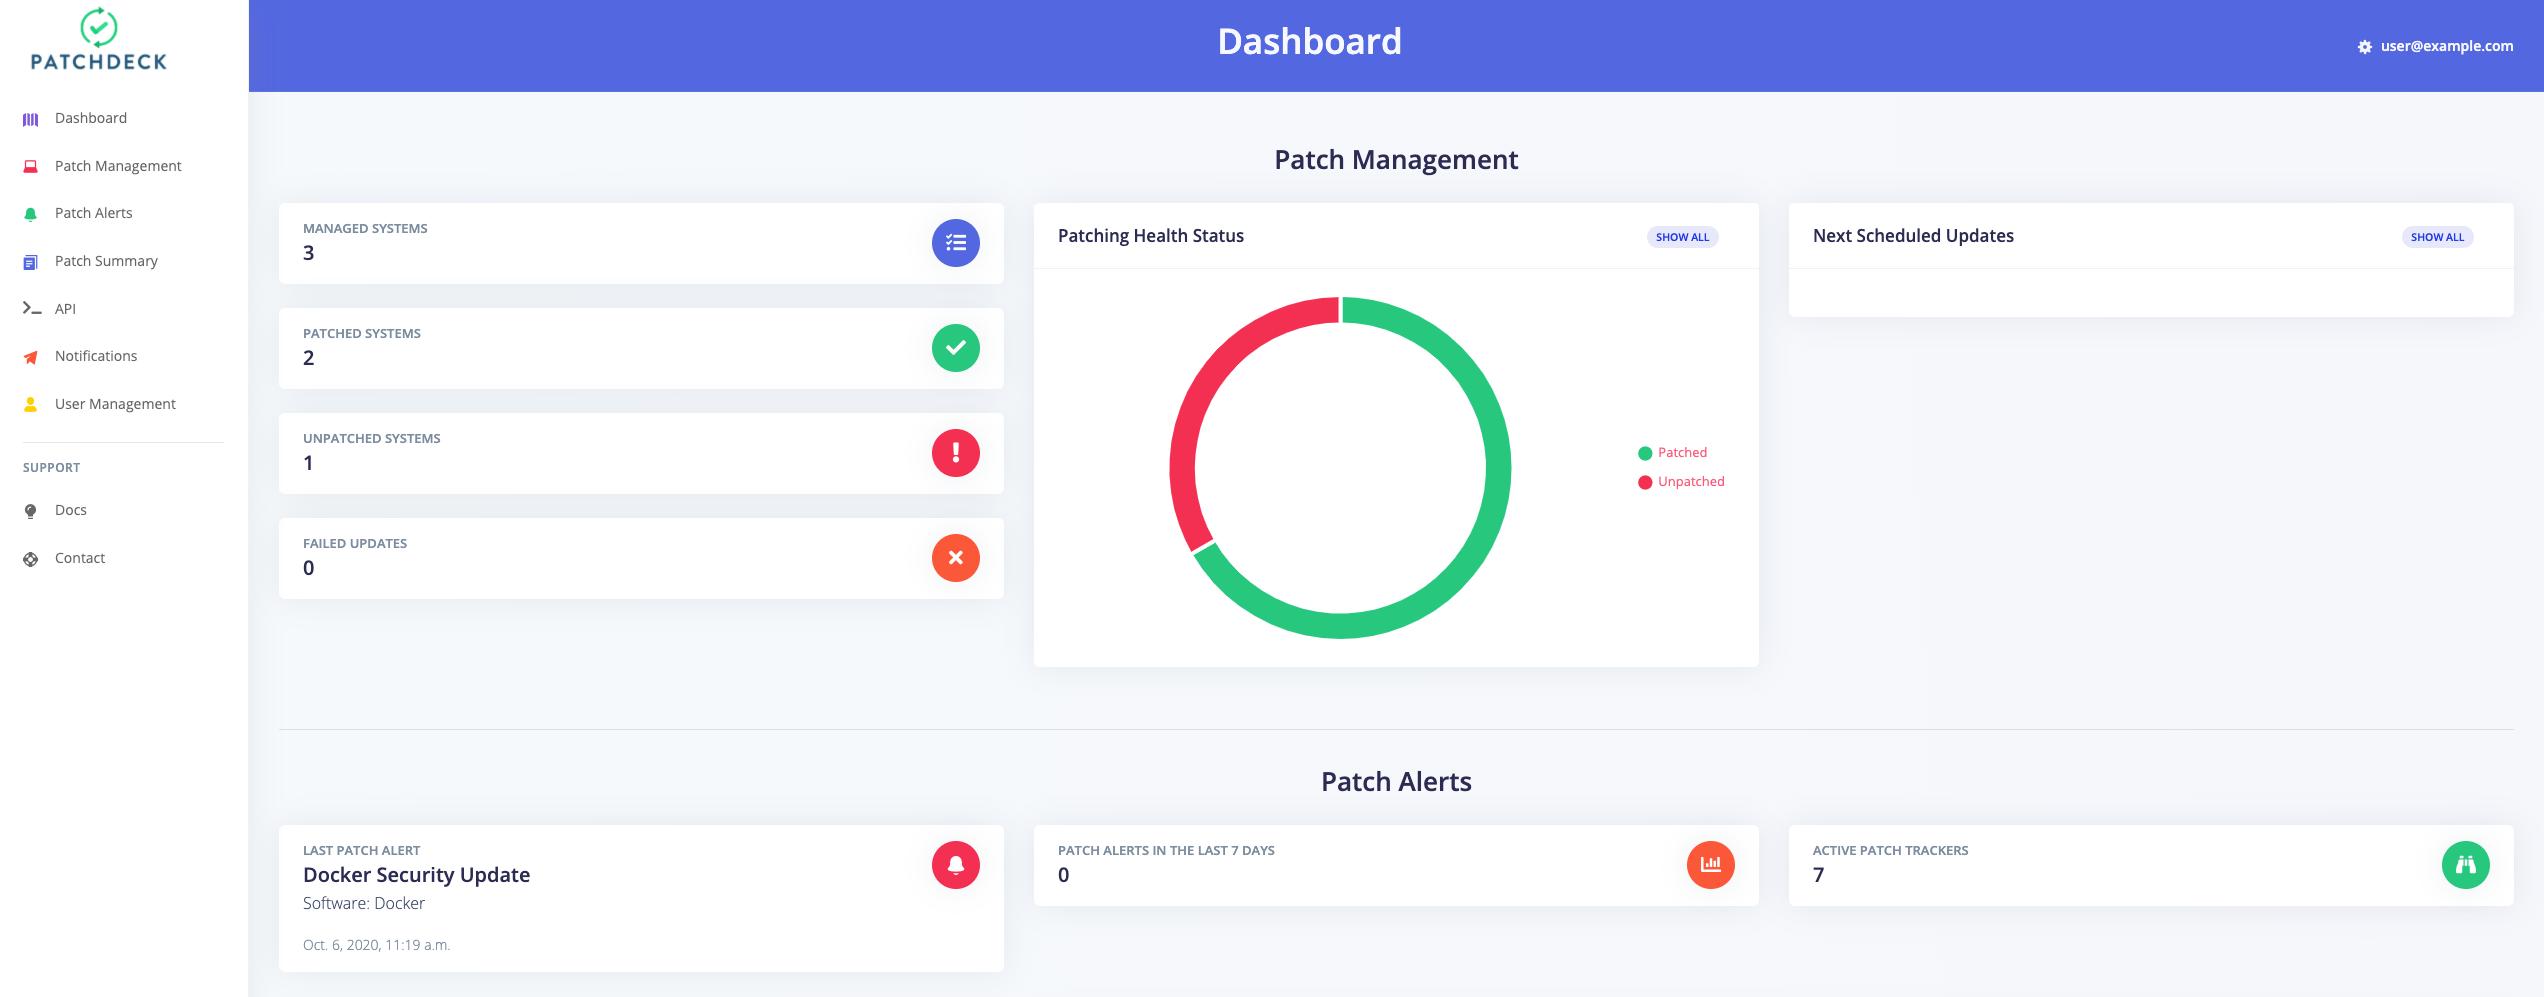 Patchdeck application dashboard